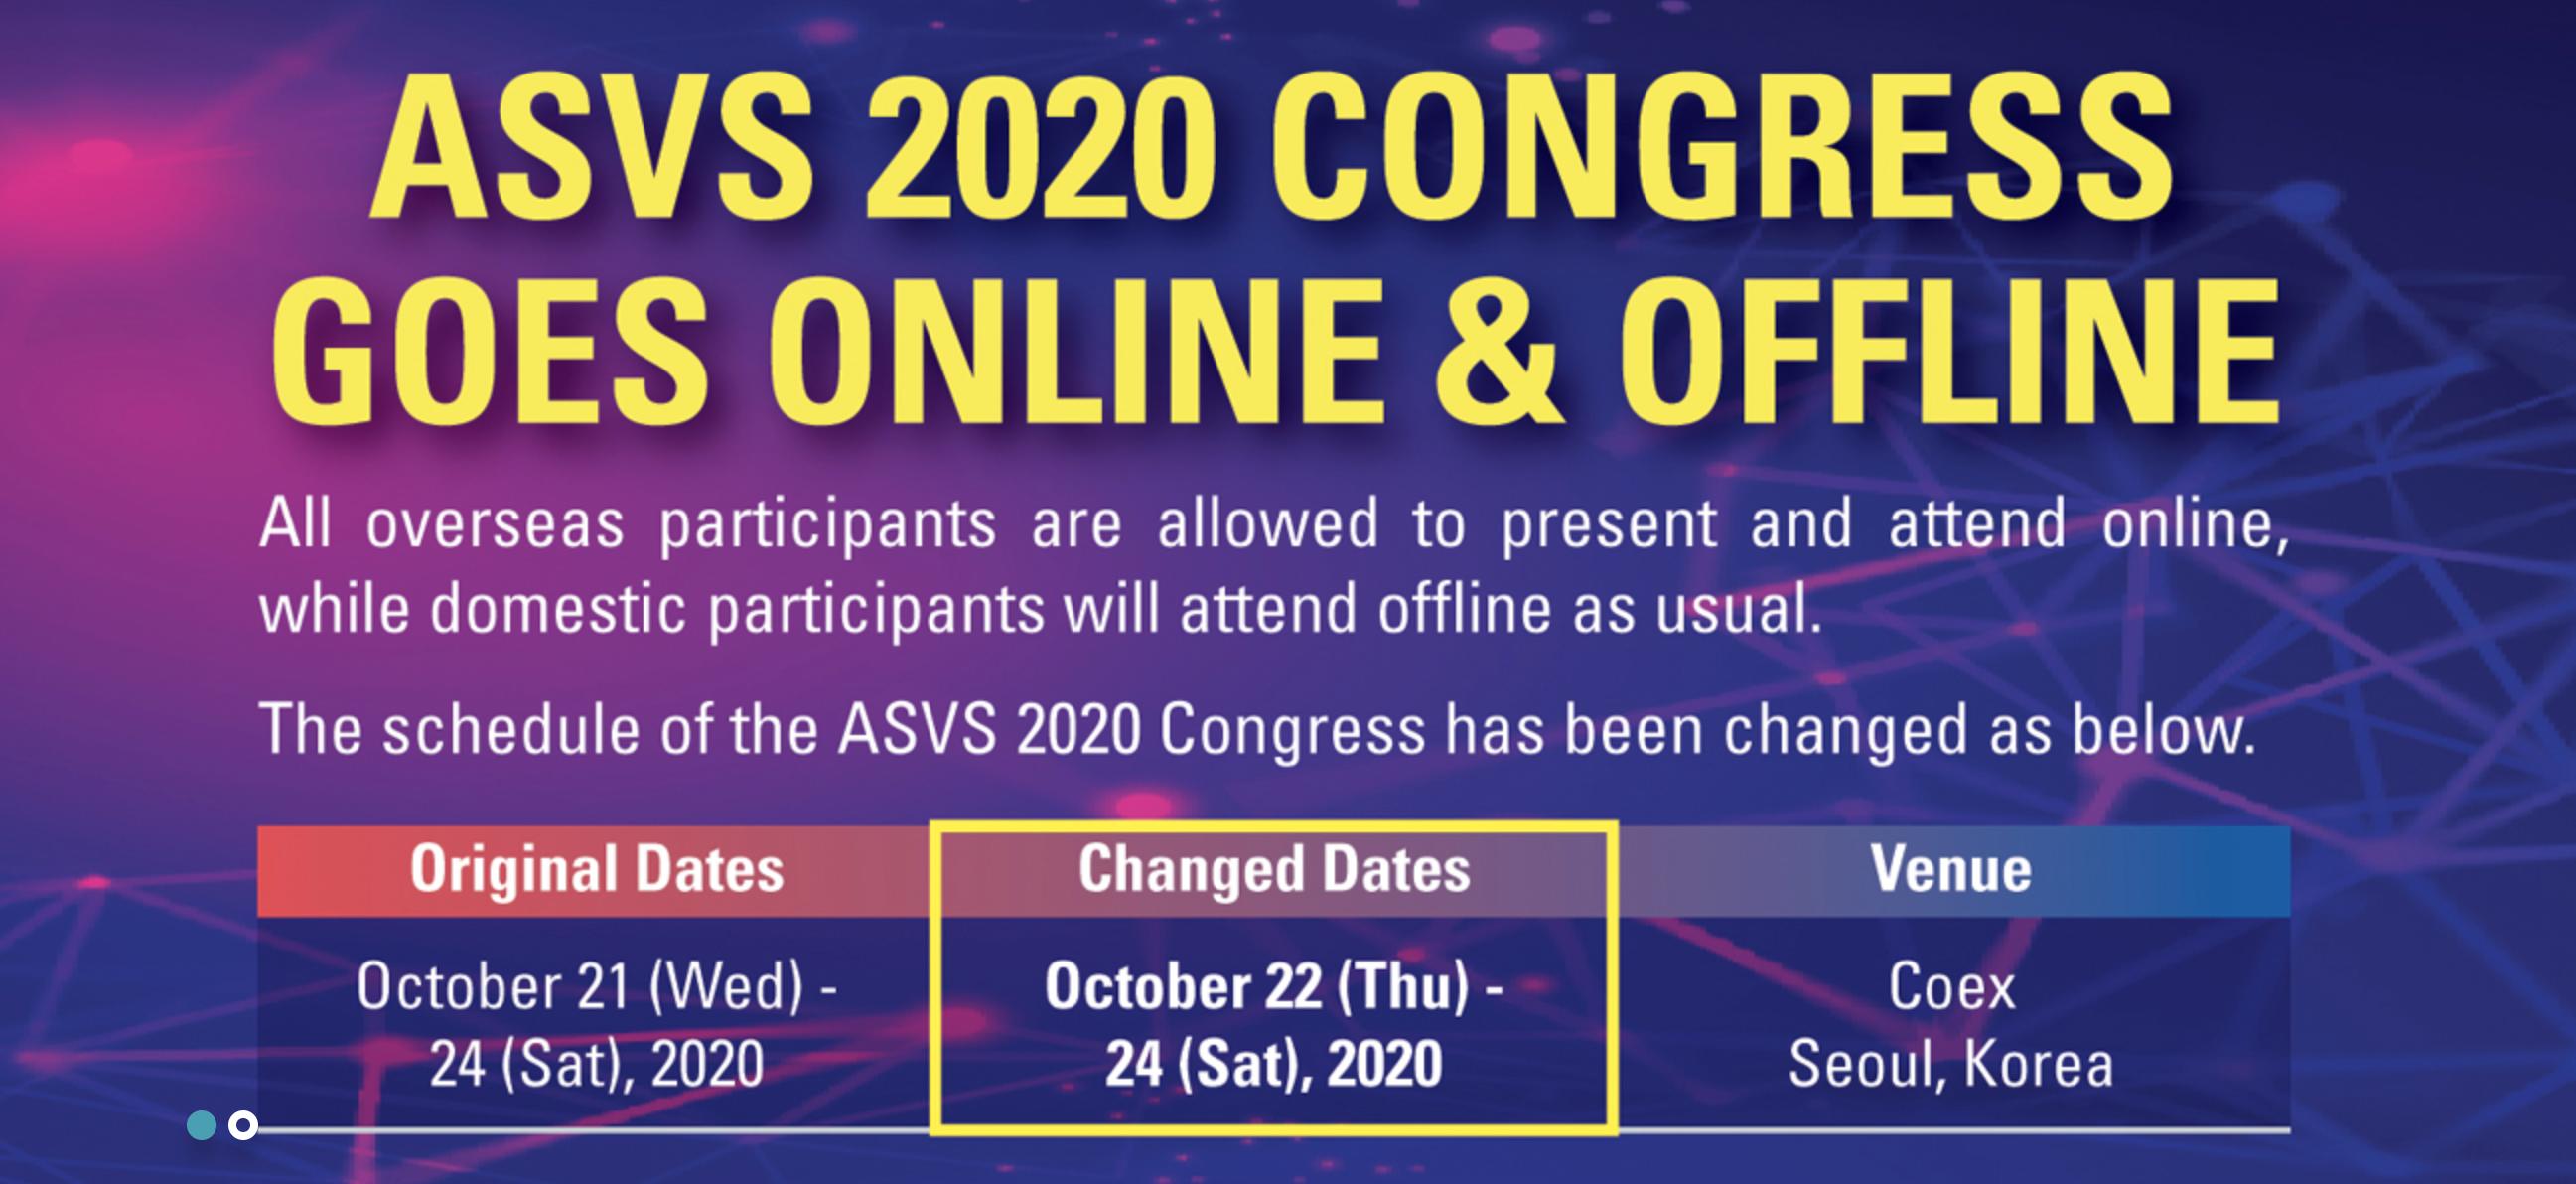 ASVS (Asian Society for Vascular Surgery)